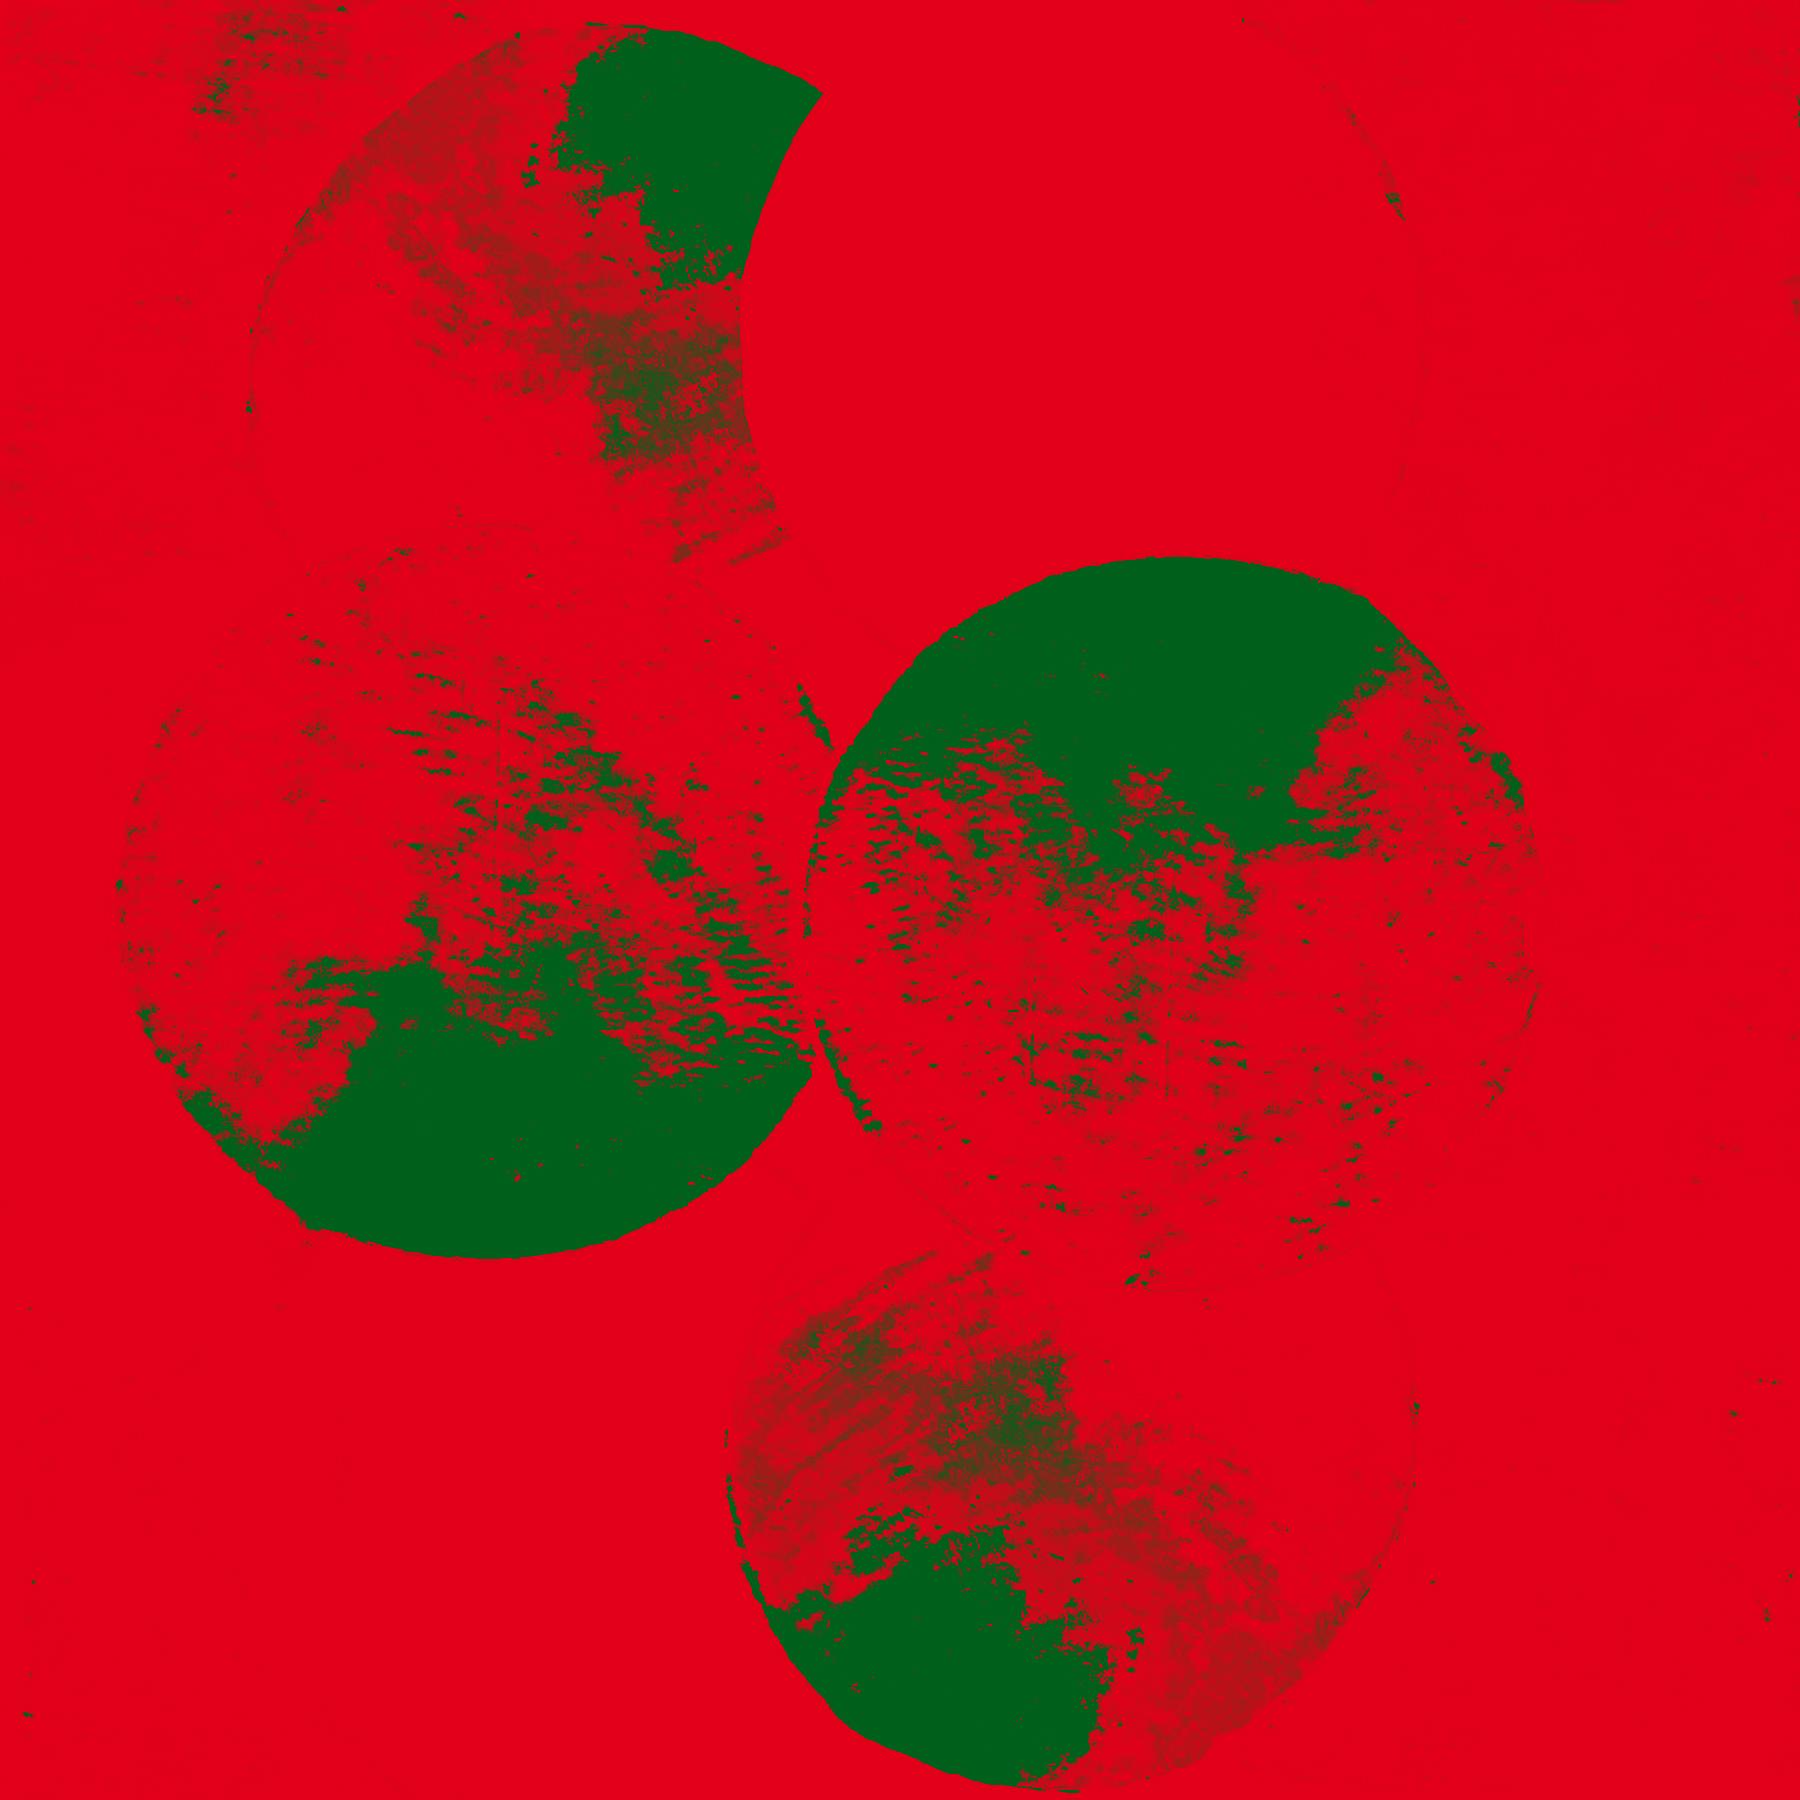 RedSix Red .jpg